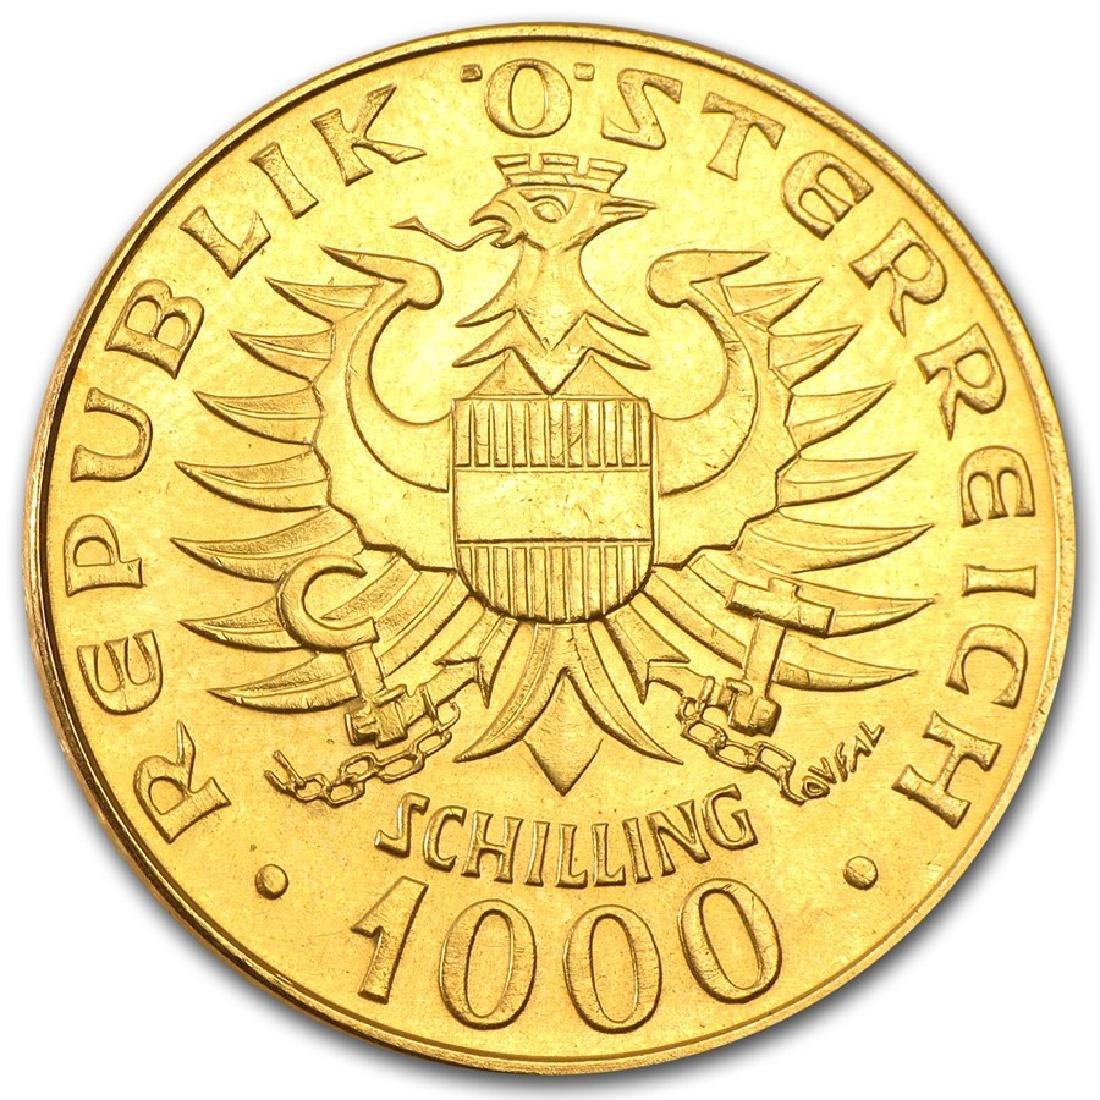 1976 Austria 1000 Schilling Gold Coin - 2